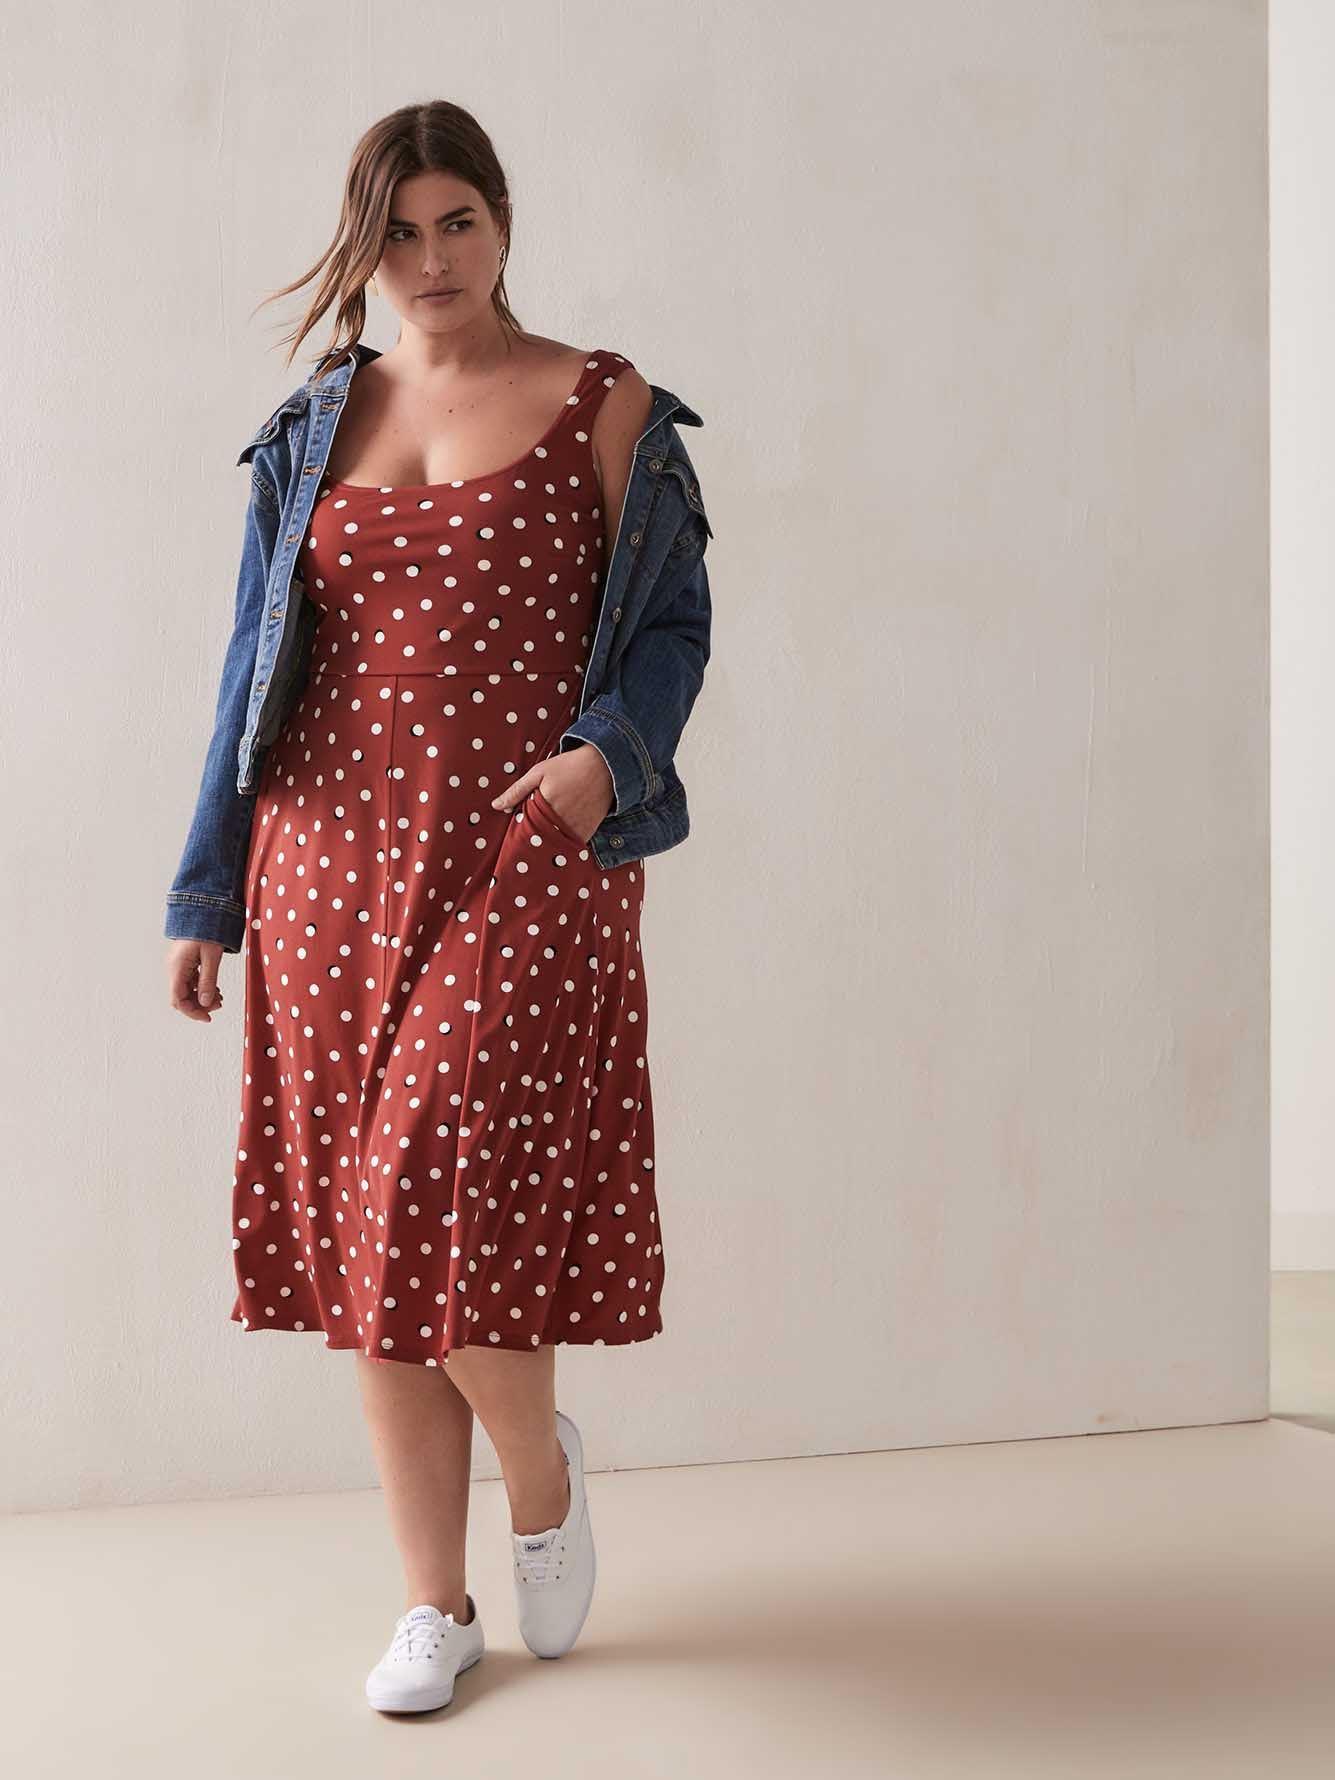 Polka Dot Dress with Square Neck | Penningtons